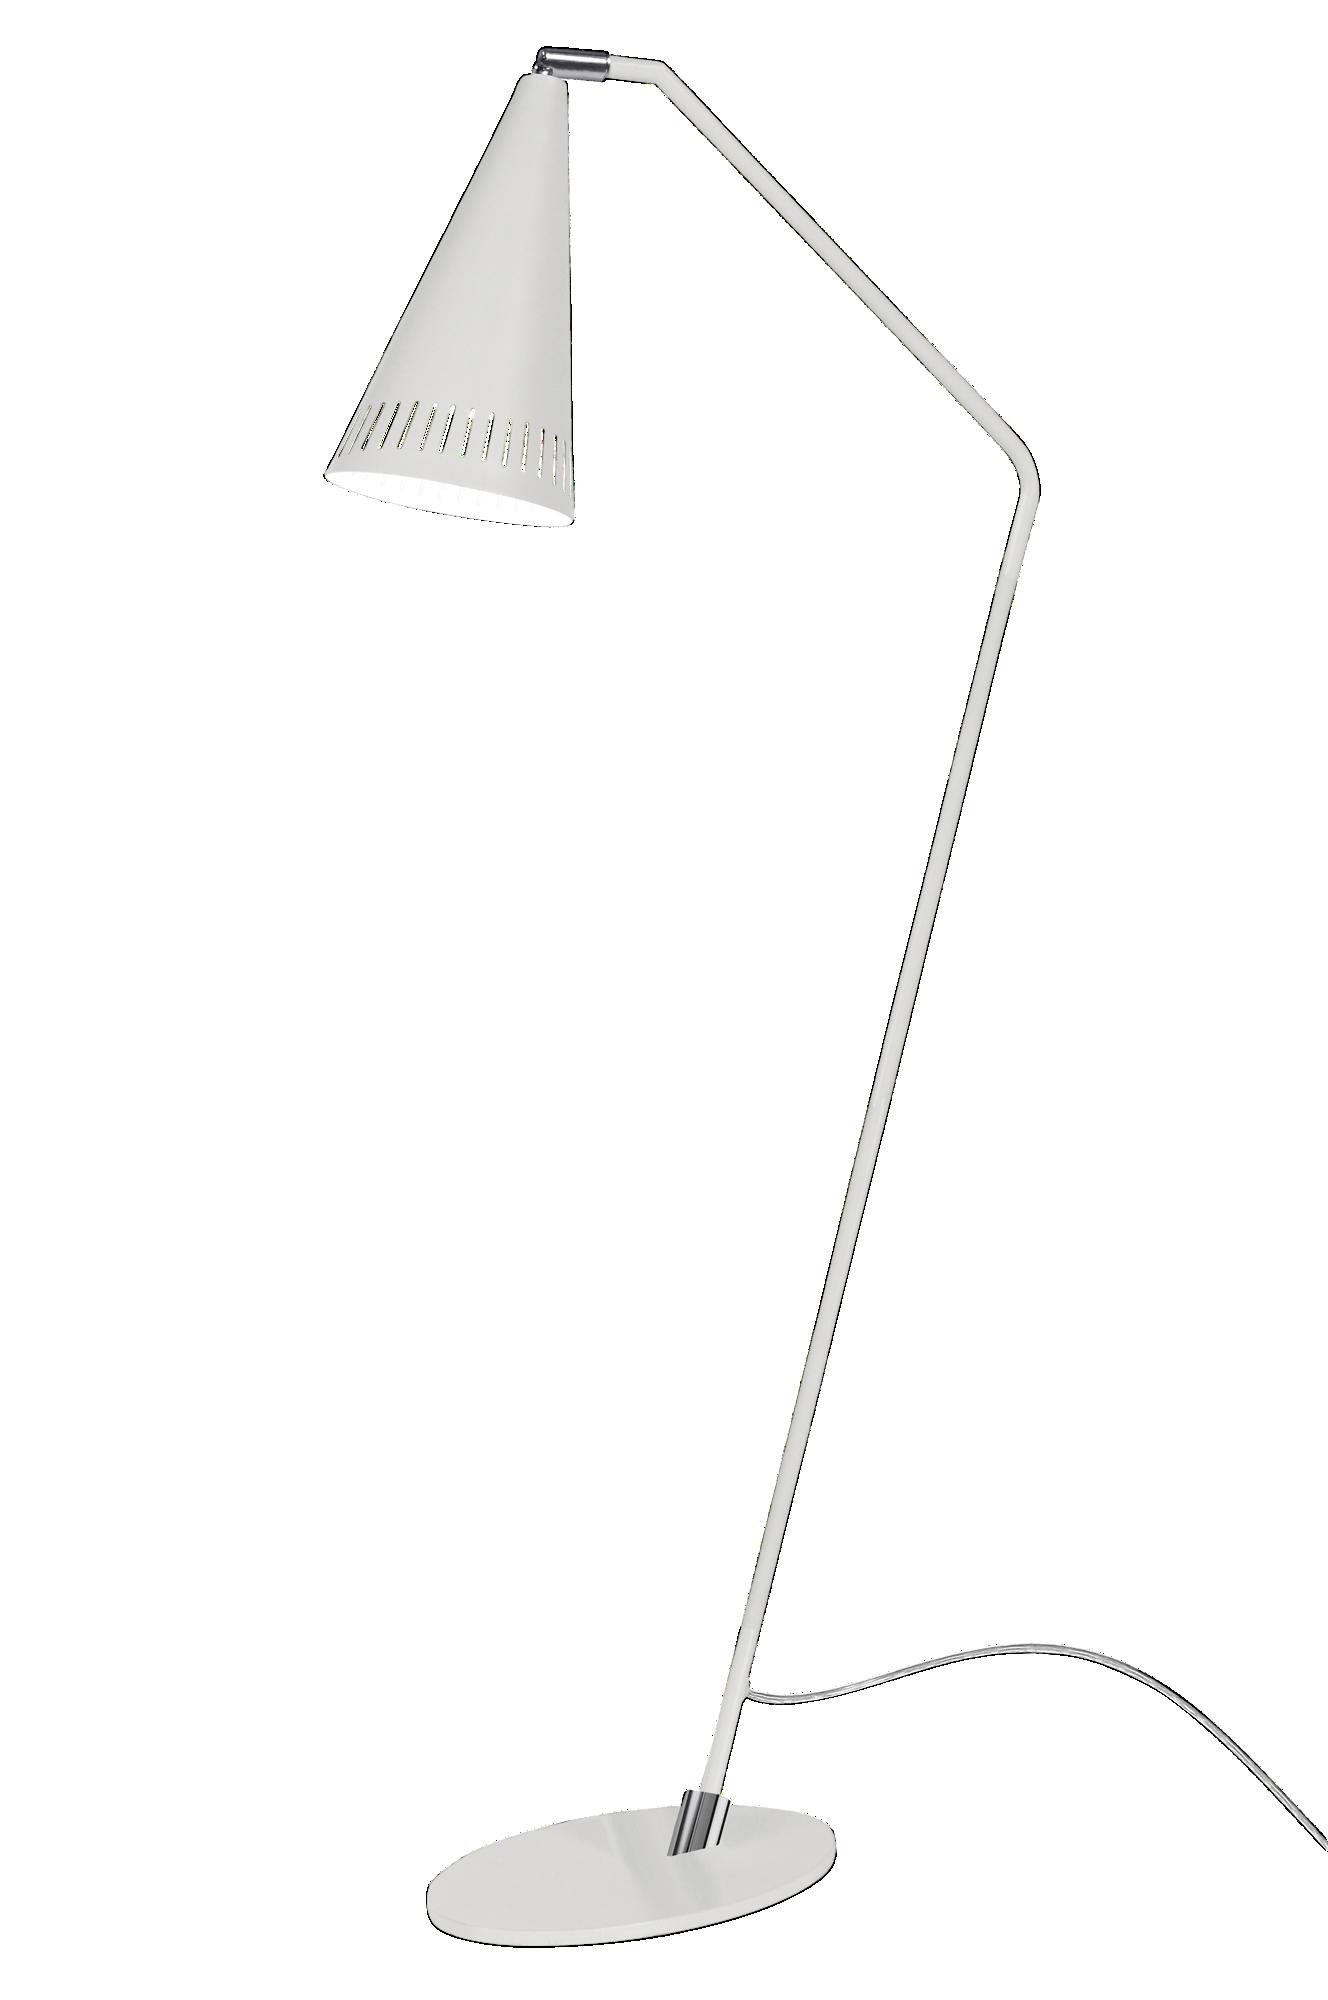 Globen lighting gulvlampe hvid bolig indretning - Globen lighting ...